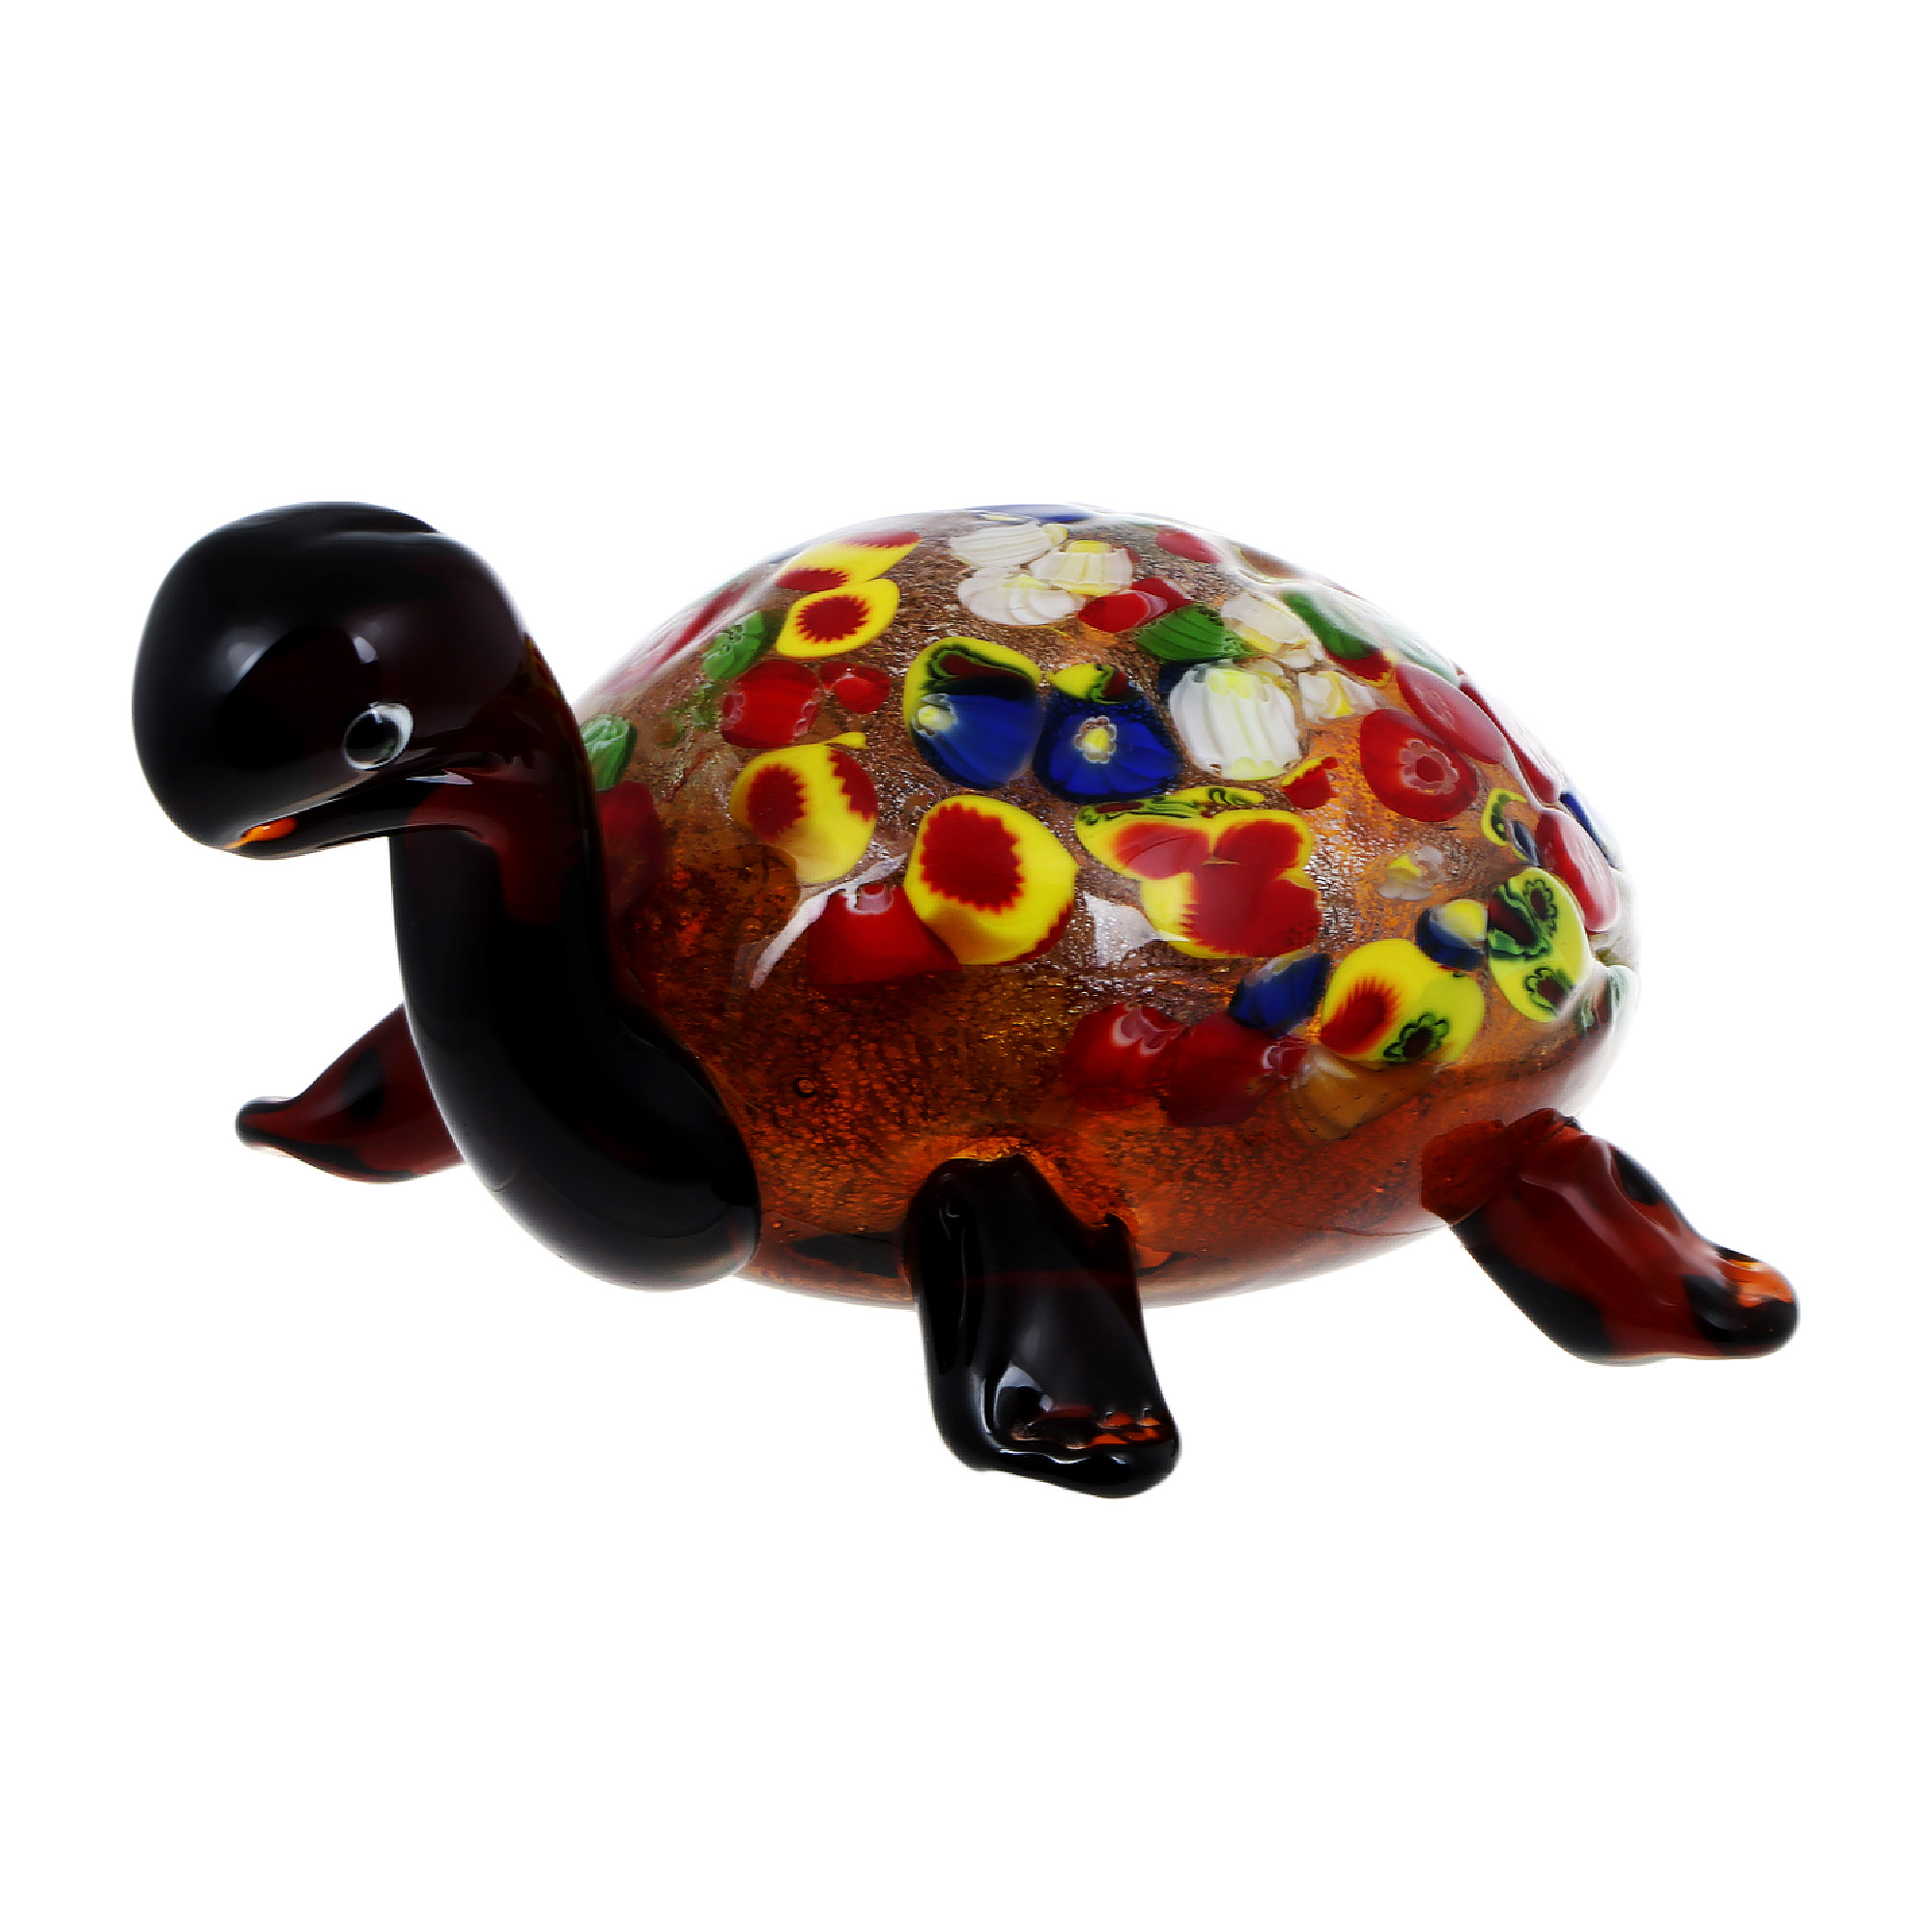 Фигурка Art glass черепаха 18х9 см фигурка art glass пеликан 22х26 см